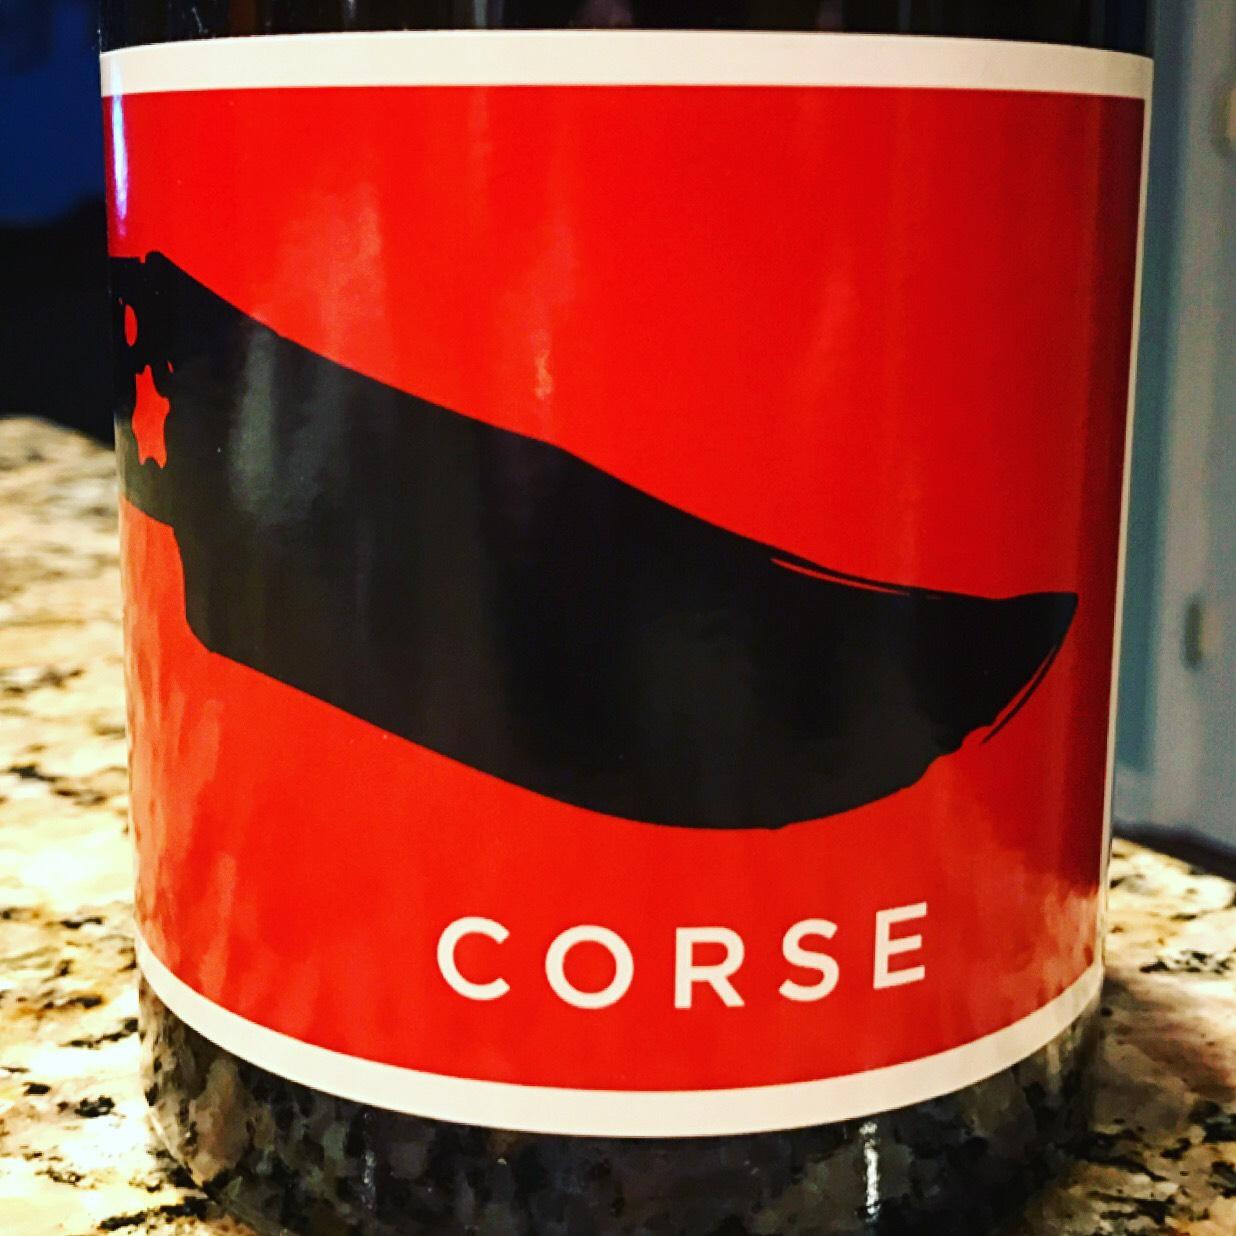 The Nittany Epicurean Locations Wines Corse Corsican White Wine